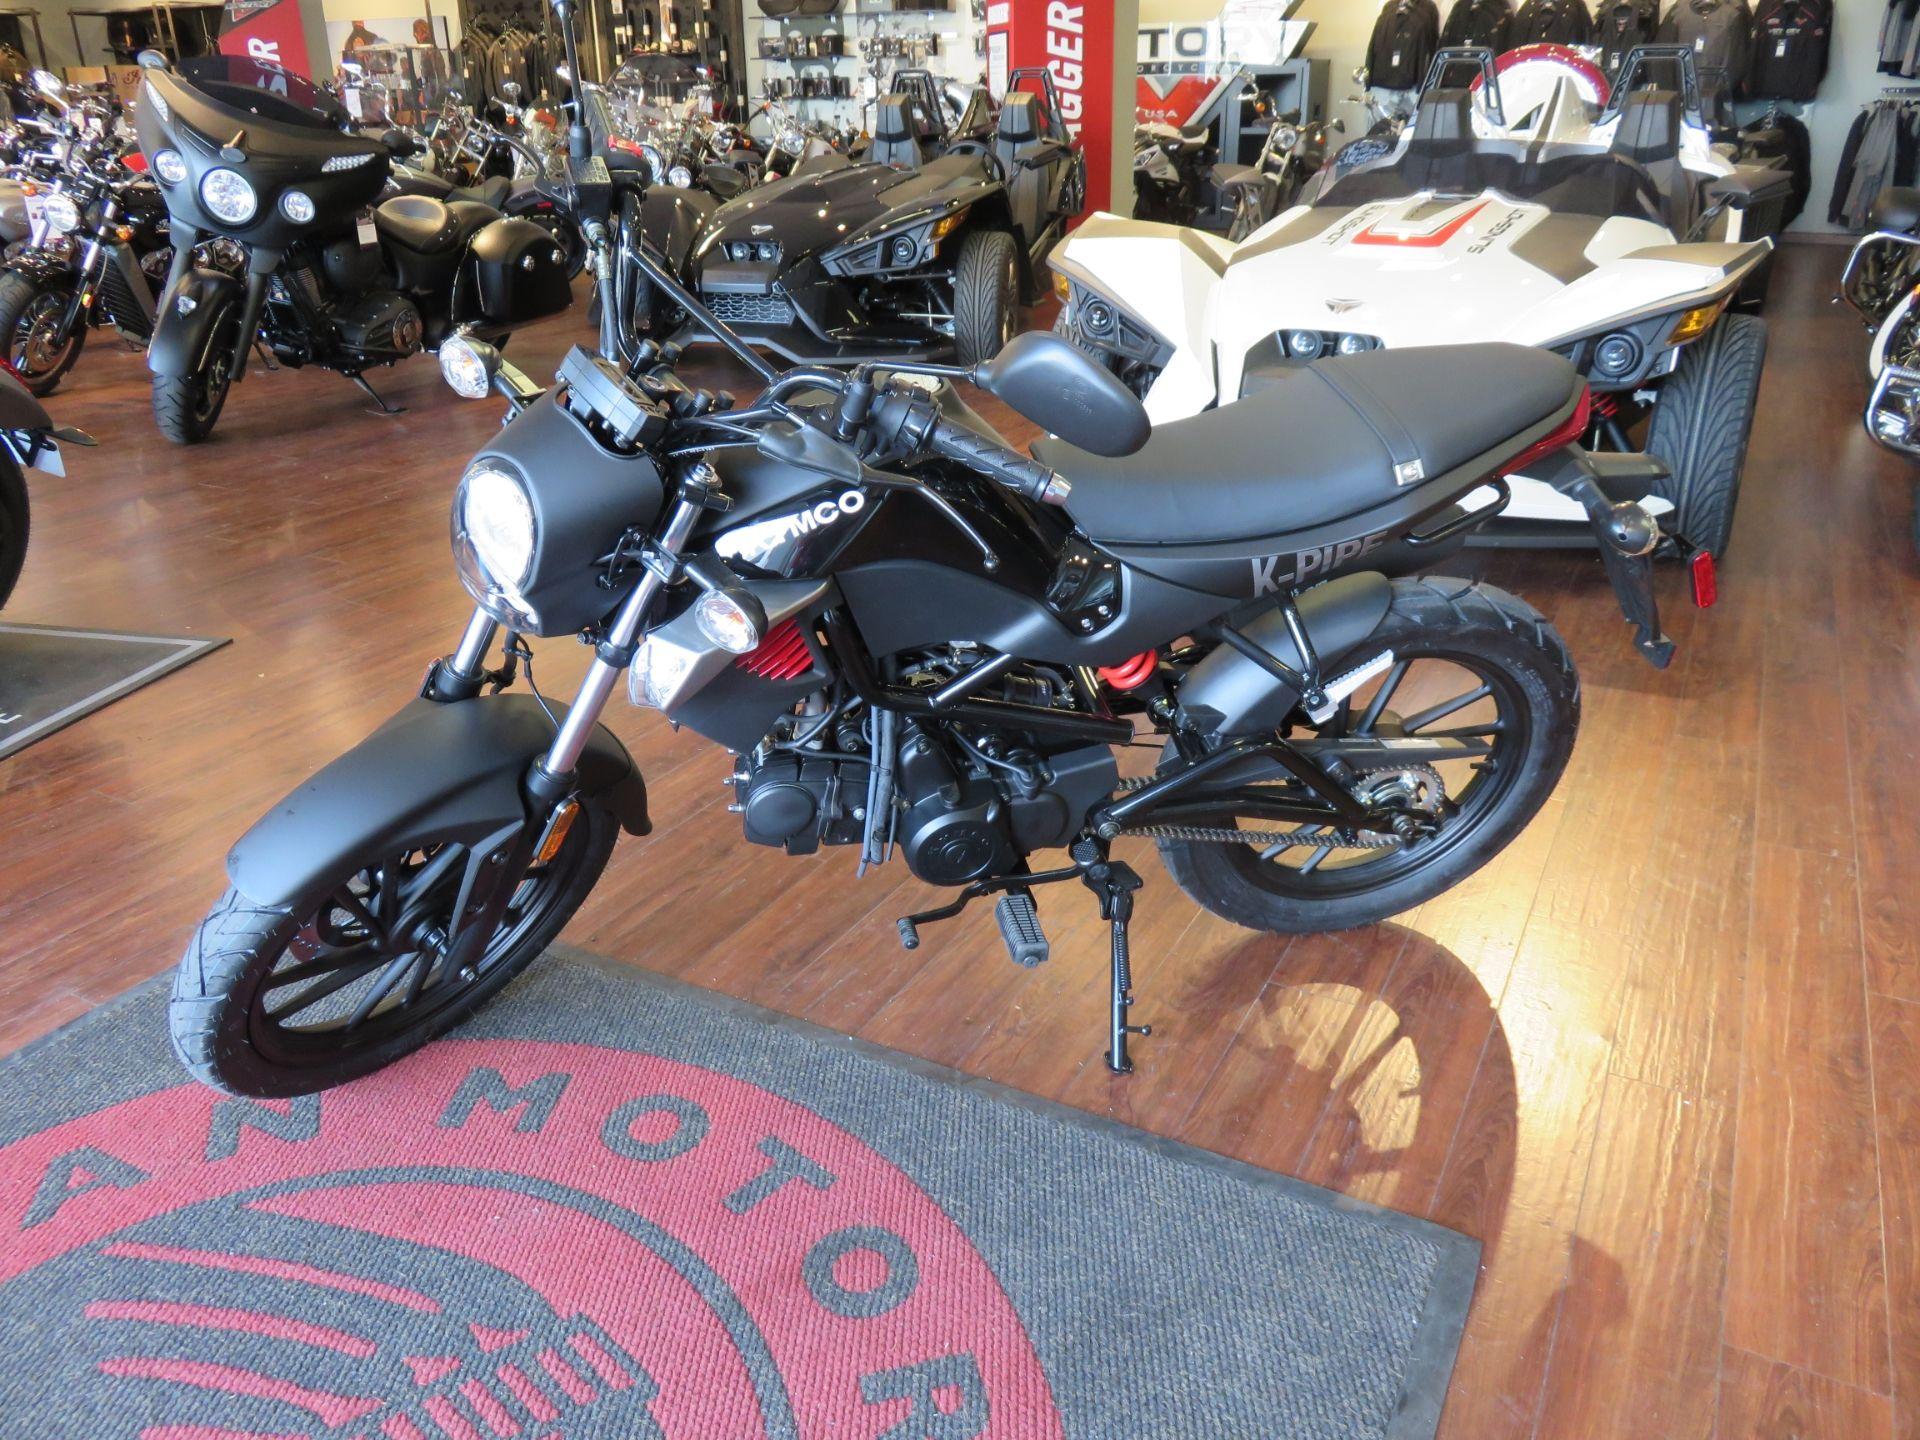 National black bikers roundup 2016 - 2016 Kymco K Pipe 125cc In Matt Black Great Starter Bike